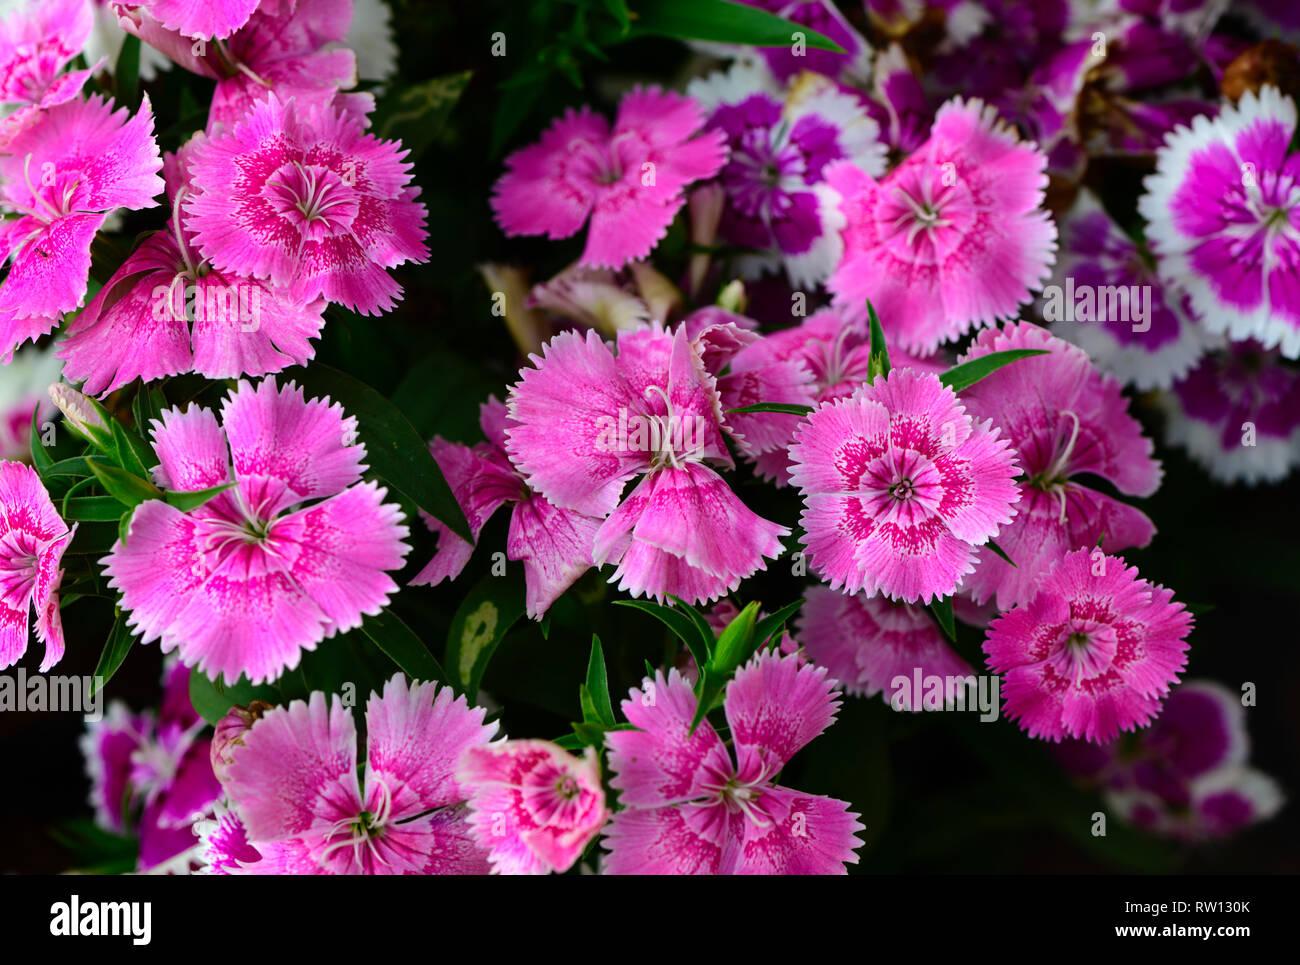 Beautiful pink Dianthus flower in garden, top view - Stock Image